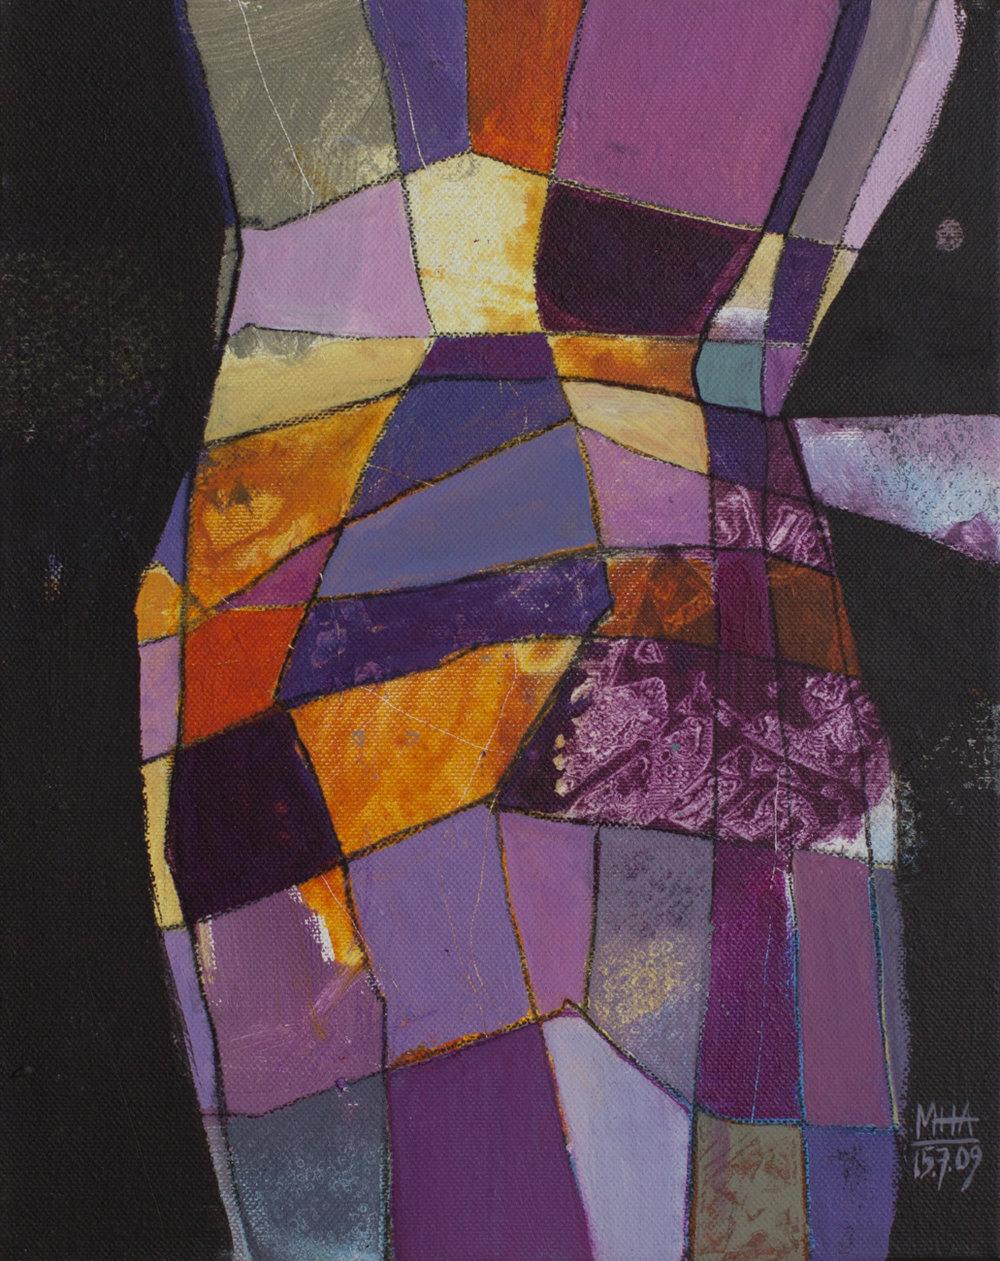 Fantasie in Linien 18 , 2009,Acryl auf Leinwand, 24x30 cm